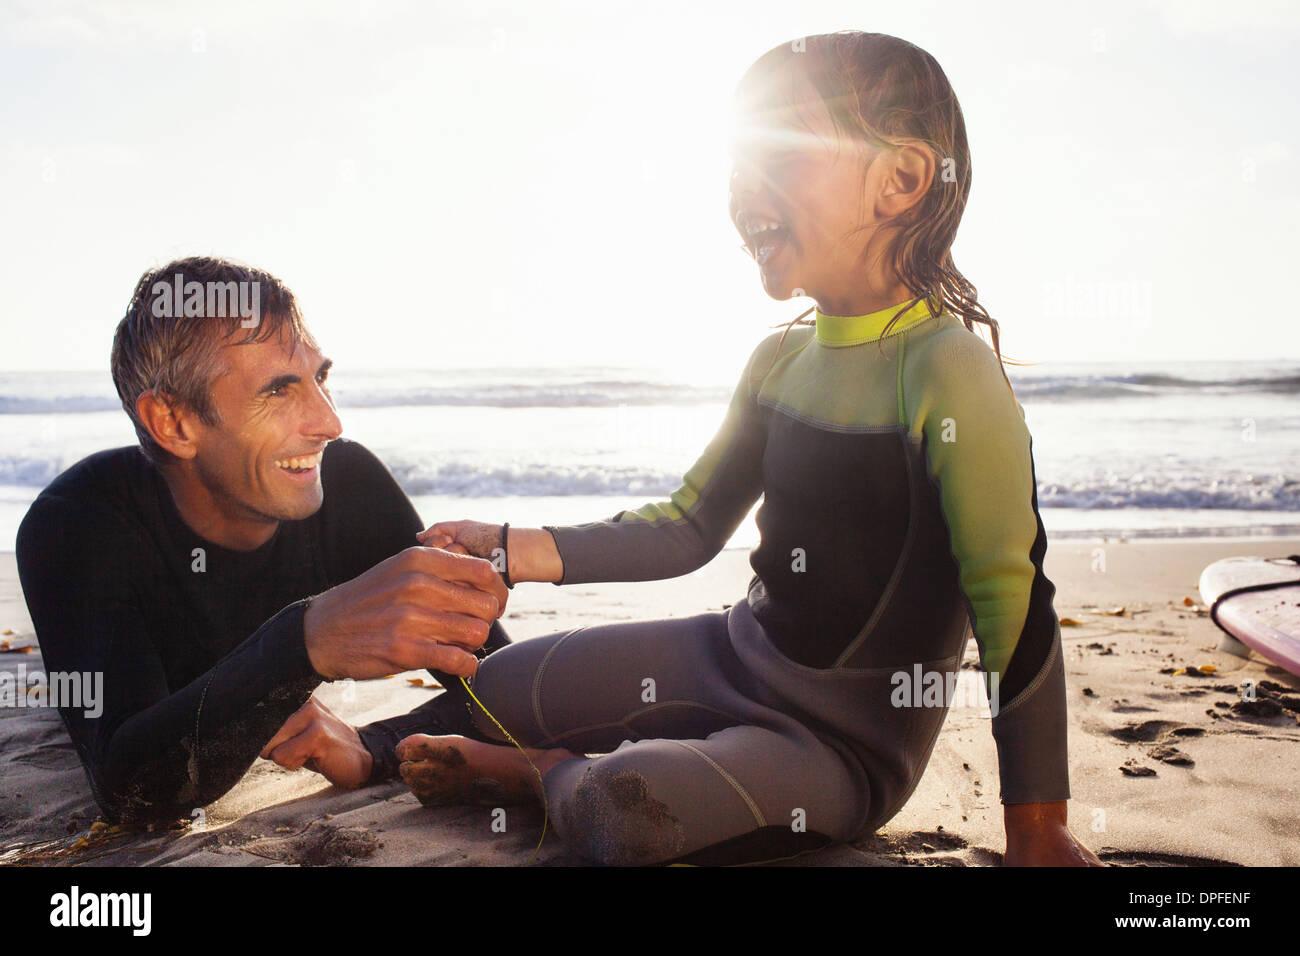 Père et fille on beach, Encinitas, Californie, USA Photo Stock